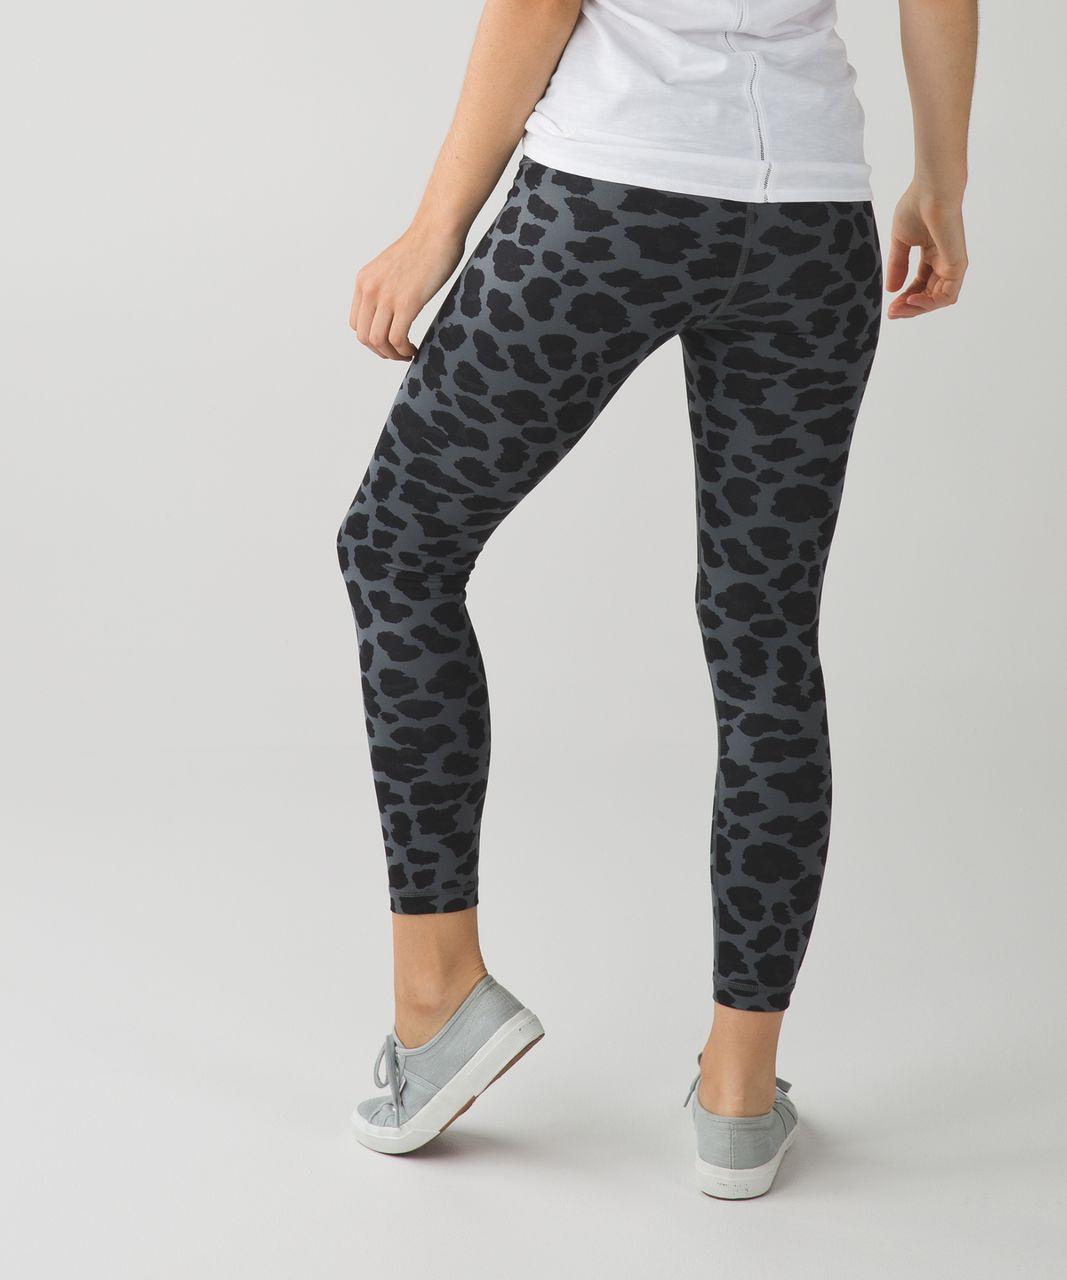 Lululemon High Times Pant *Full-On Luxtreme - Cherry Cheetah Dark Slate Black